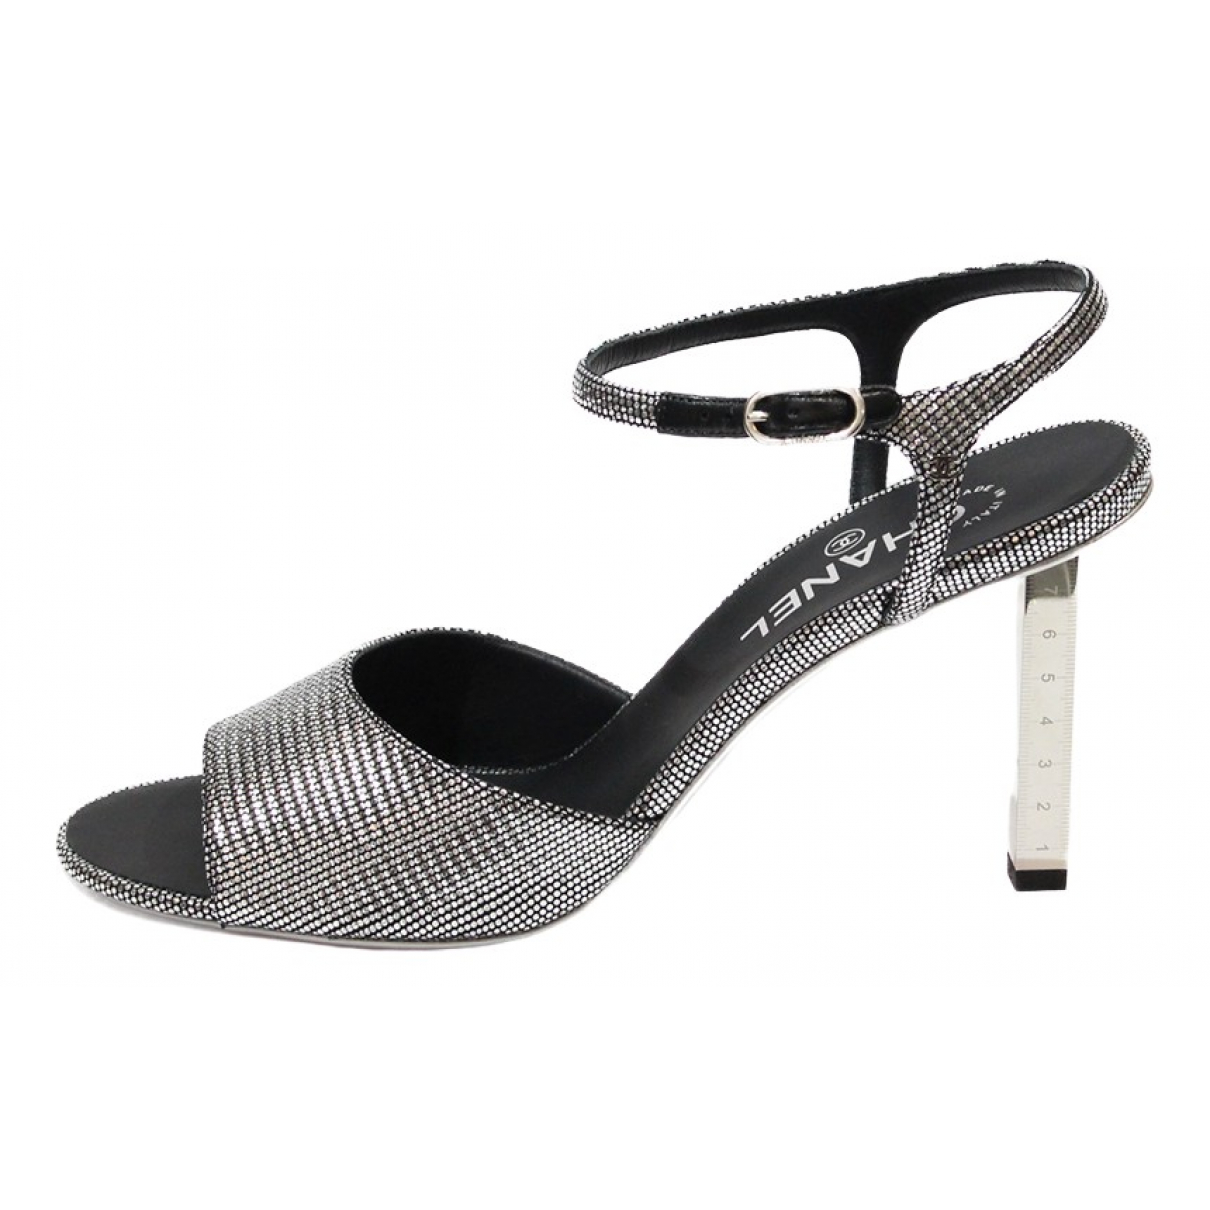 Chanel \N Silver Cloth Sandals for Women 40.5 EU